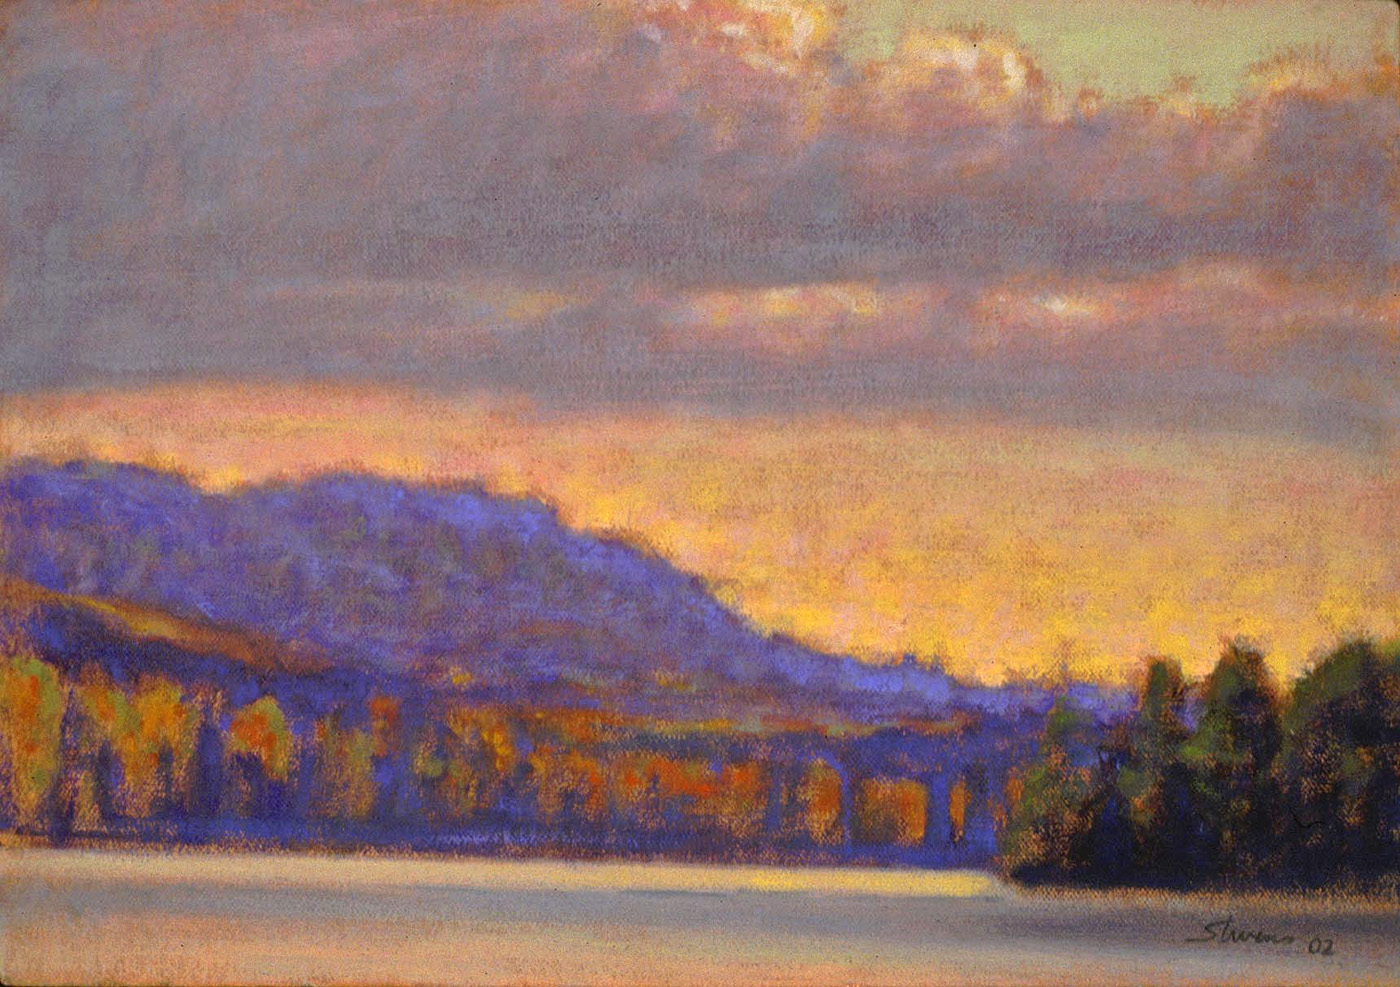 "Hopendyl   | oil on canvas | 12 x 17"" | 2002"